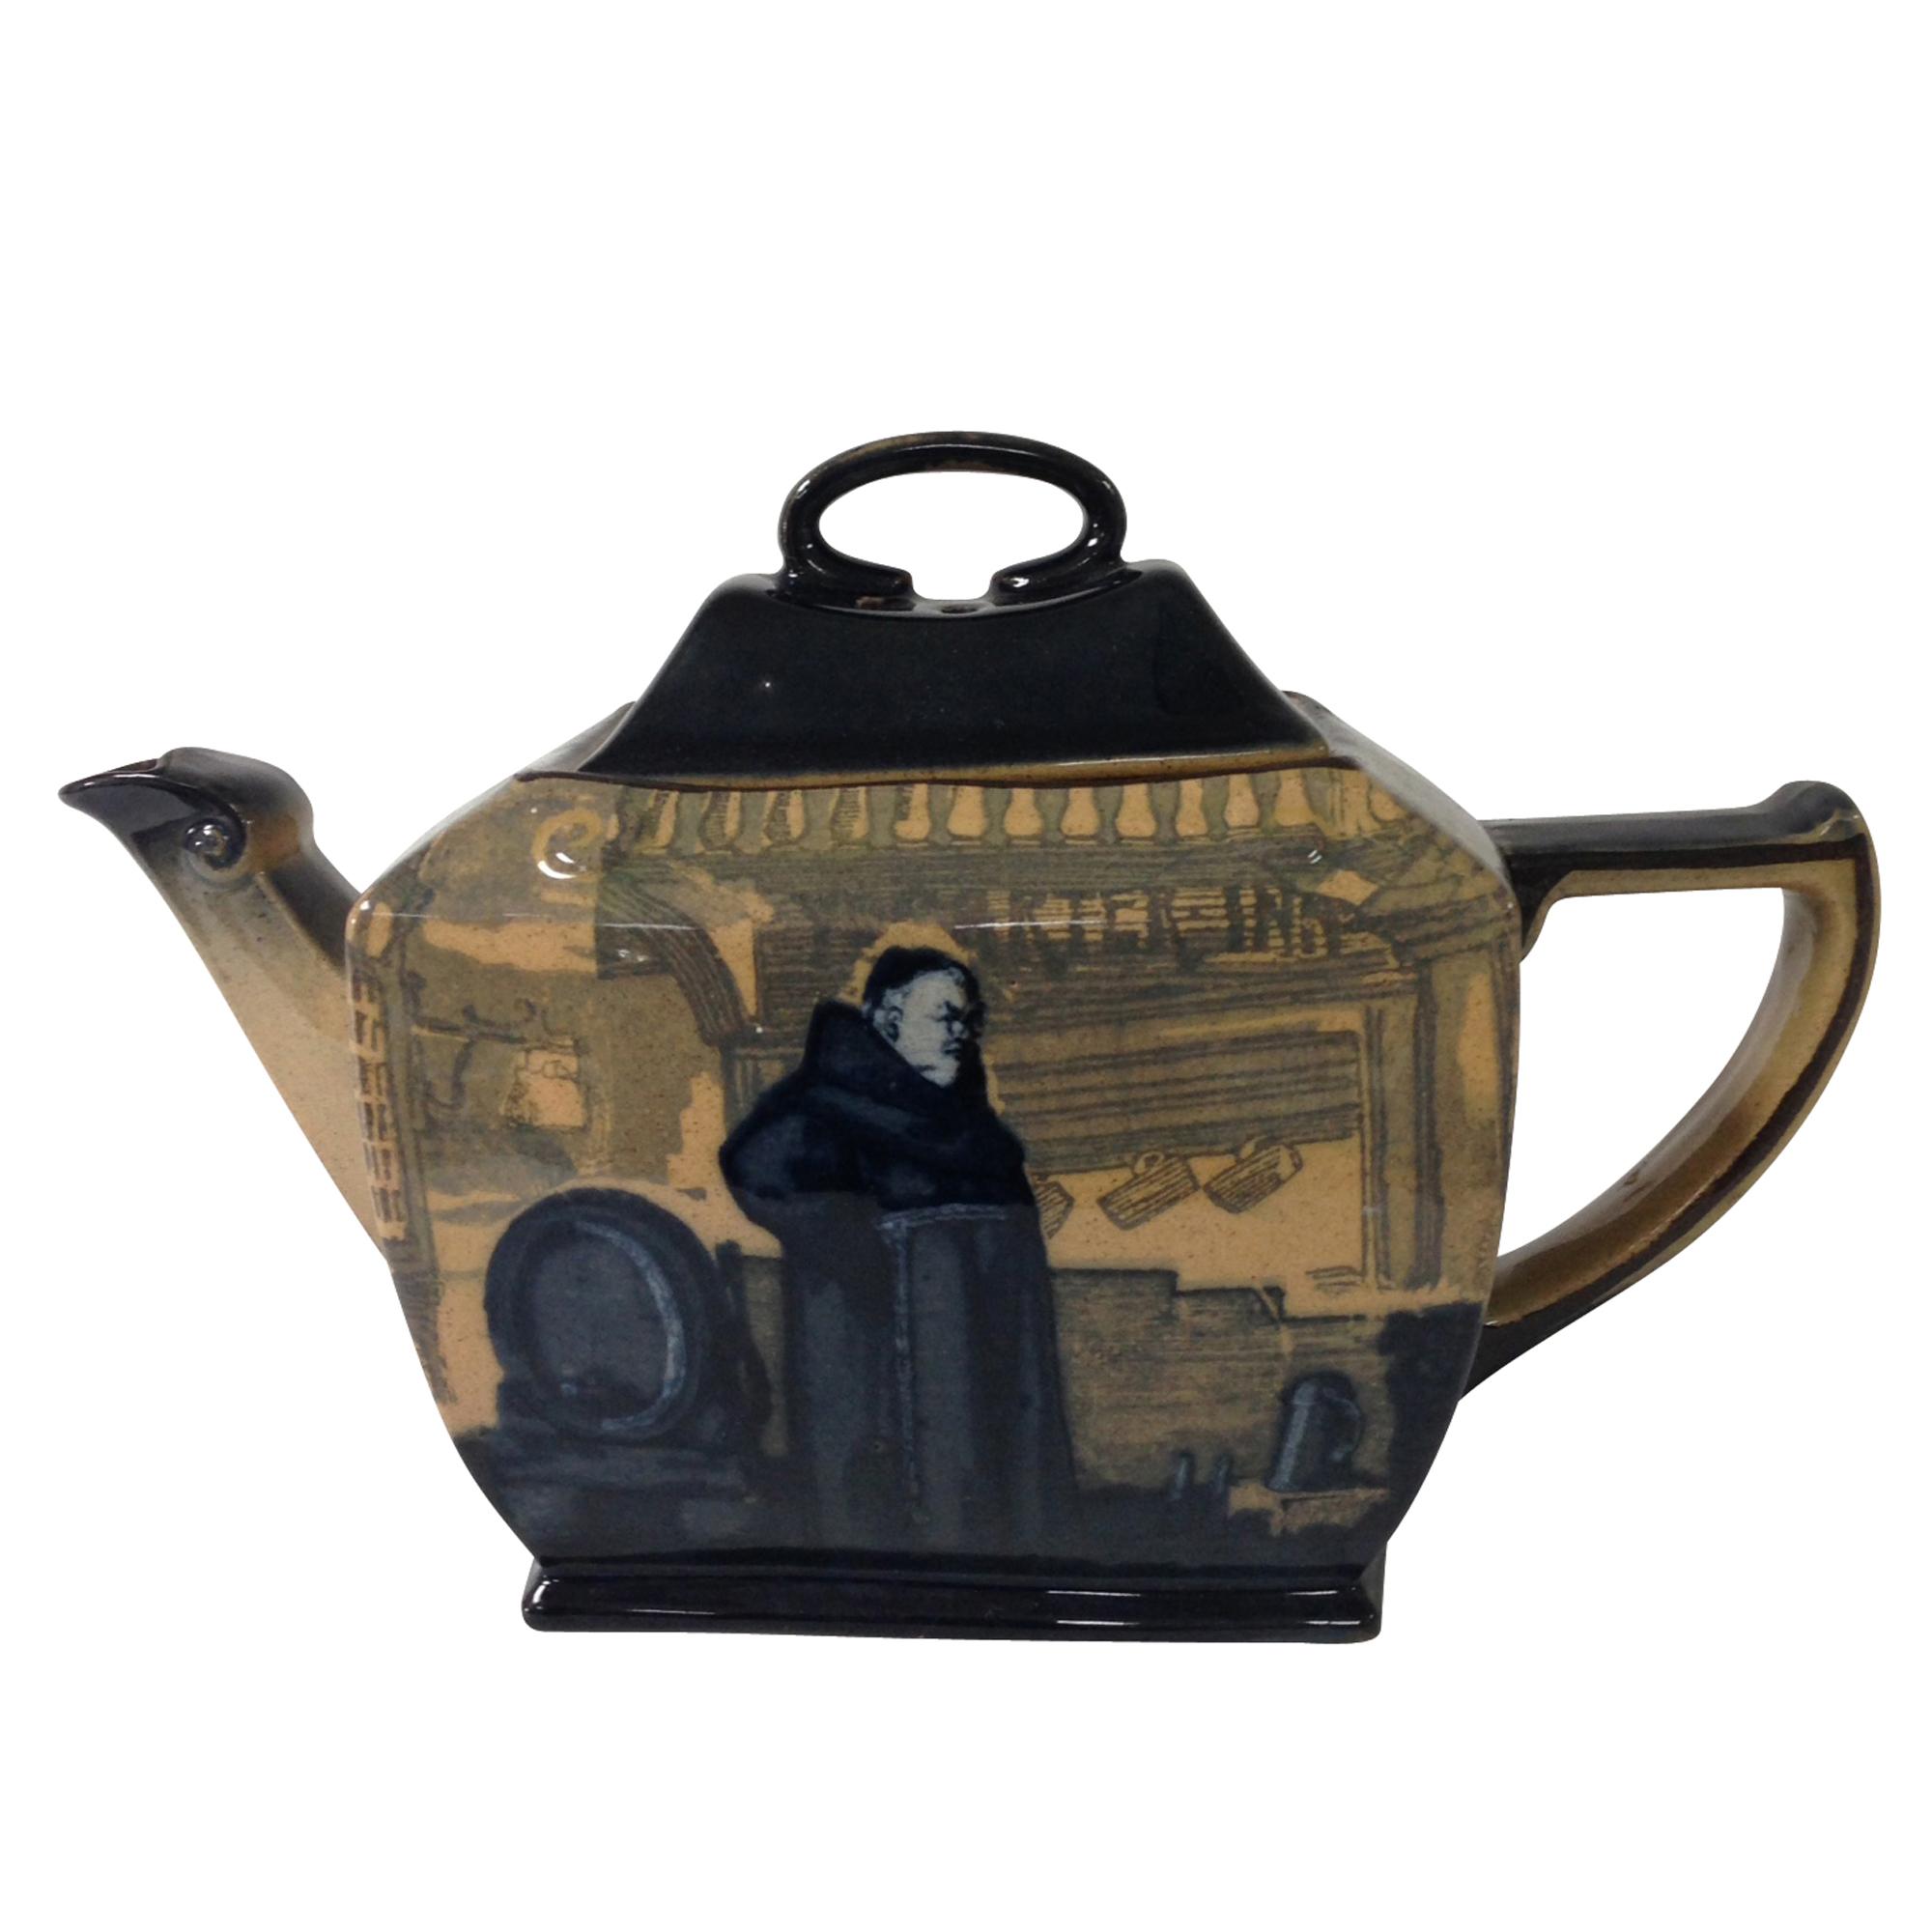 Monks in the Cellar Teapot - Royal Doulton Seriesware